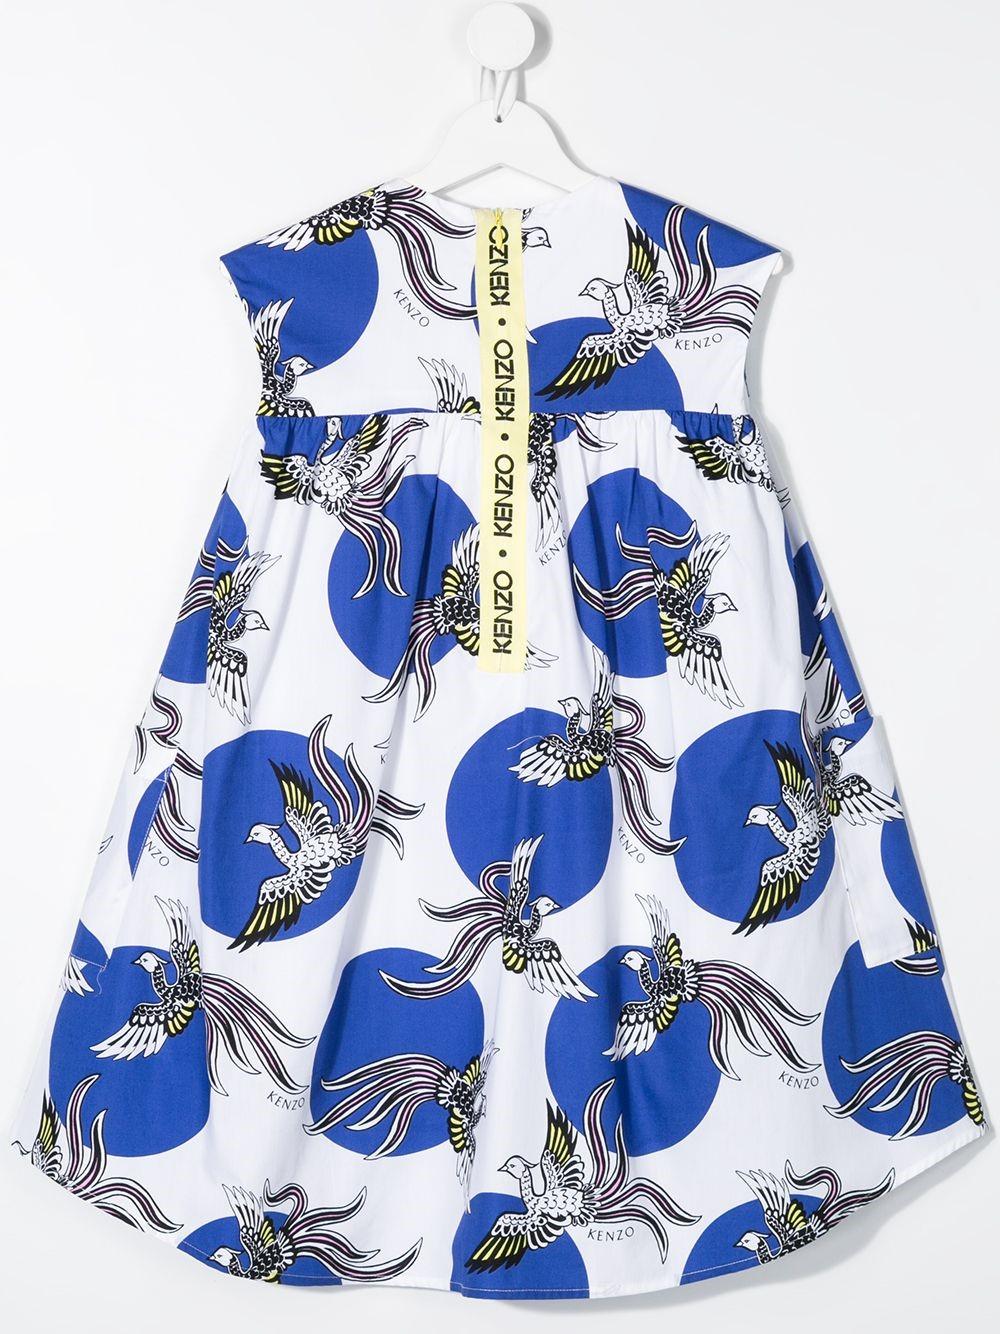 L Armadio Che Scoppia Baby Vintage Boutique.Kenzo Kids Jahnaelle Dress 2 6y Available On Montiboutique Com 32921